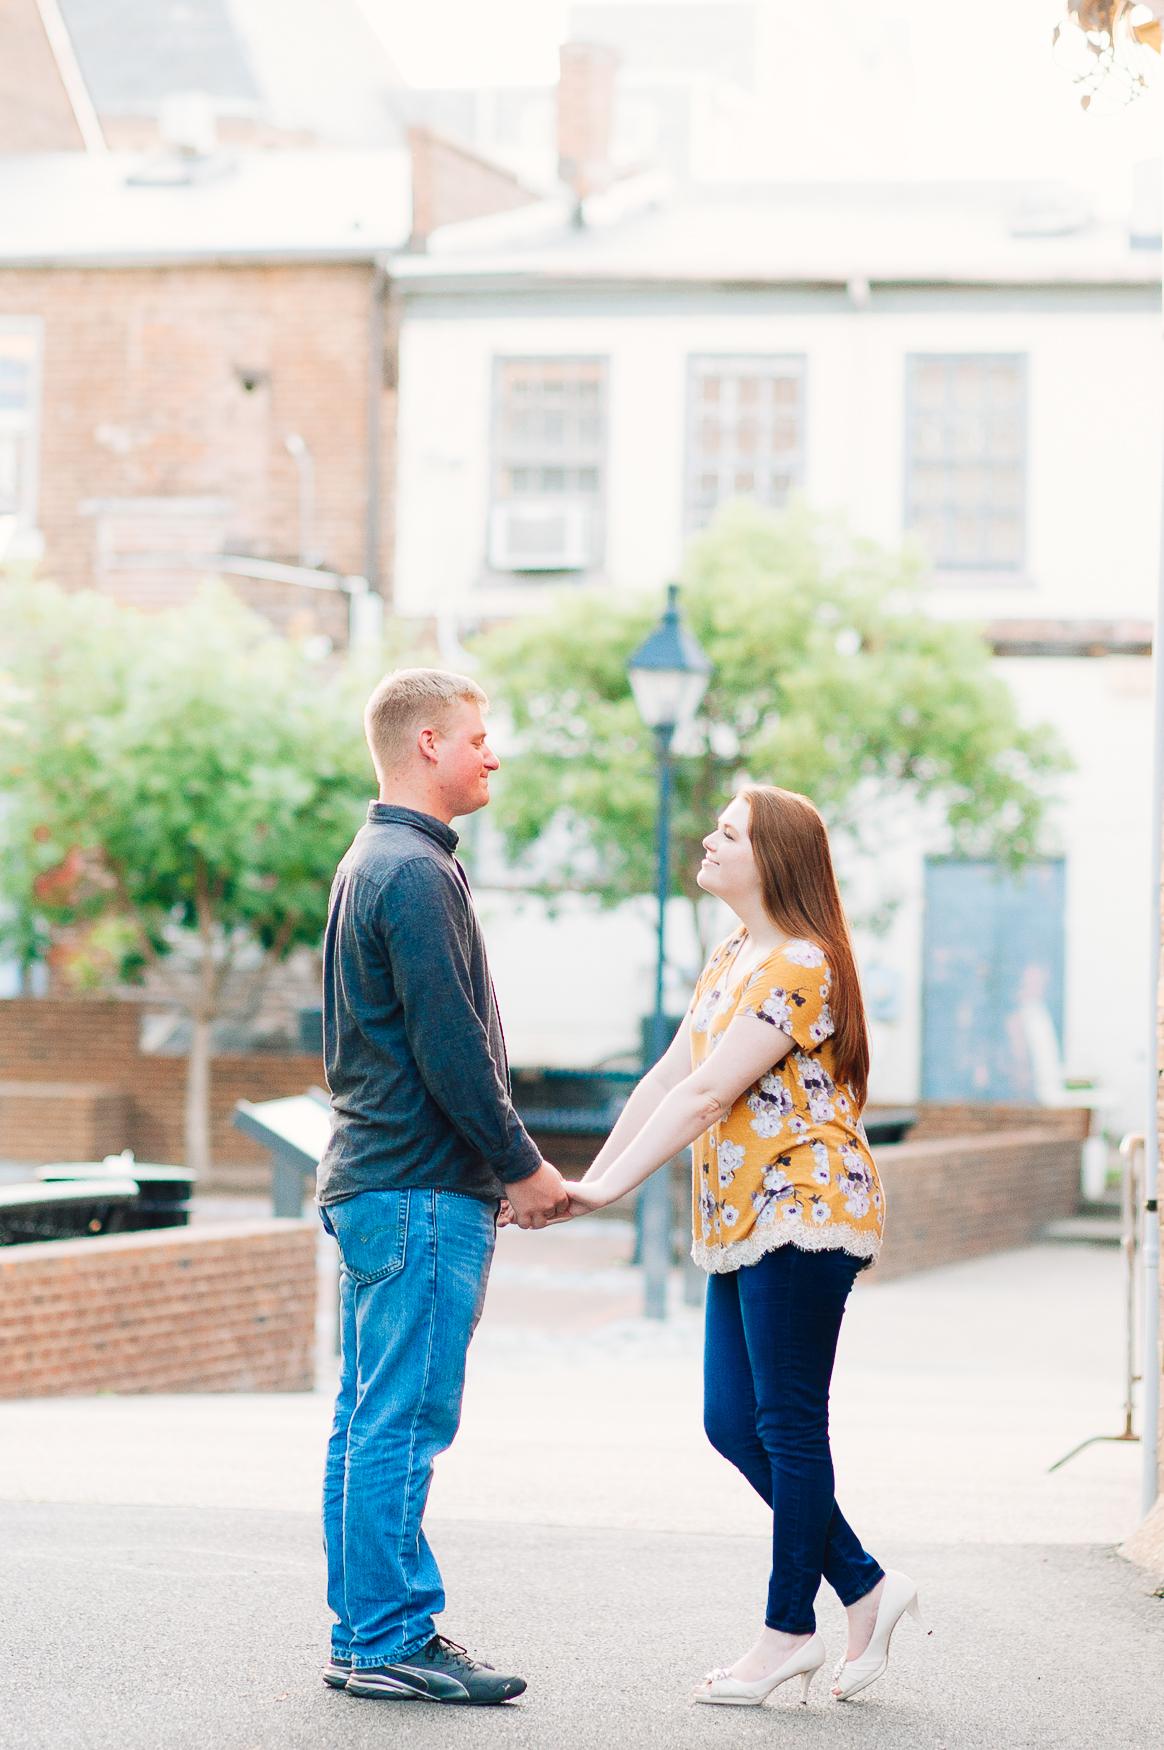 engagement_downtown_fredericksburg_virginiaweddingphotographer_youseephotography_ErinBrad (44).jpg